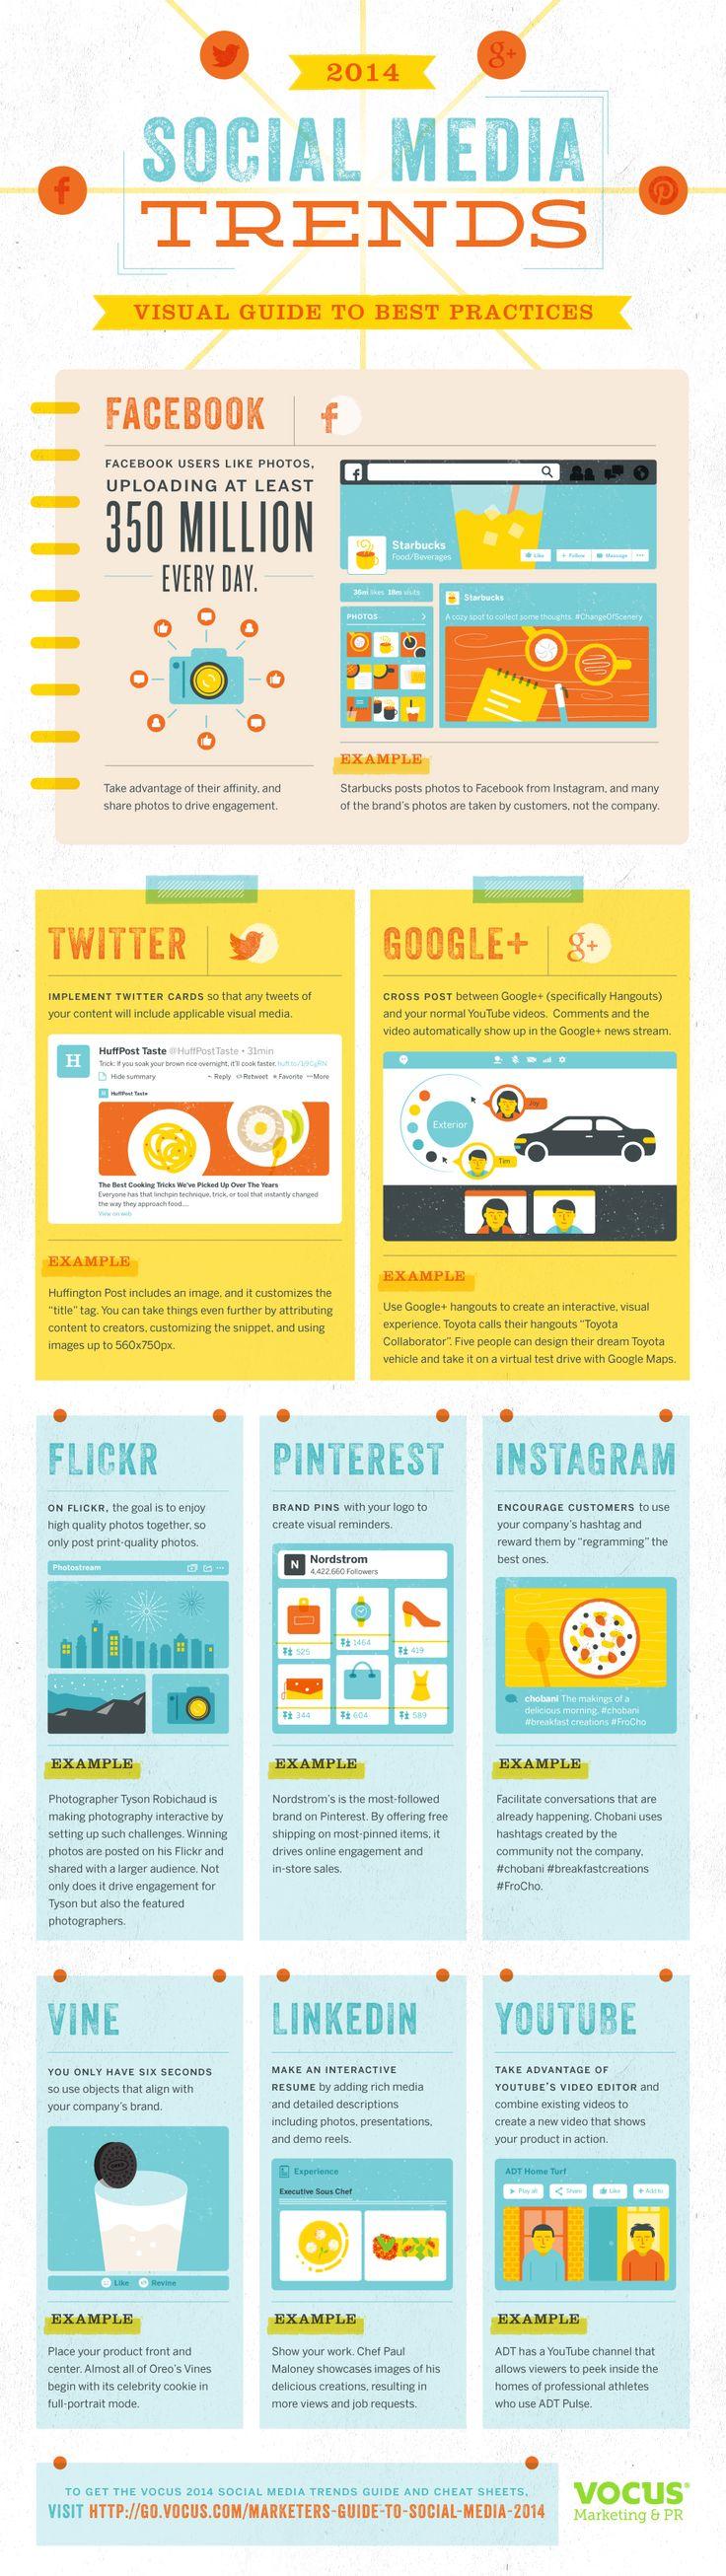 Facebook, Twitter, Pinterest, Instagram, Vine – Social Media Best Practices [INFOGRAPHIC]